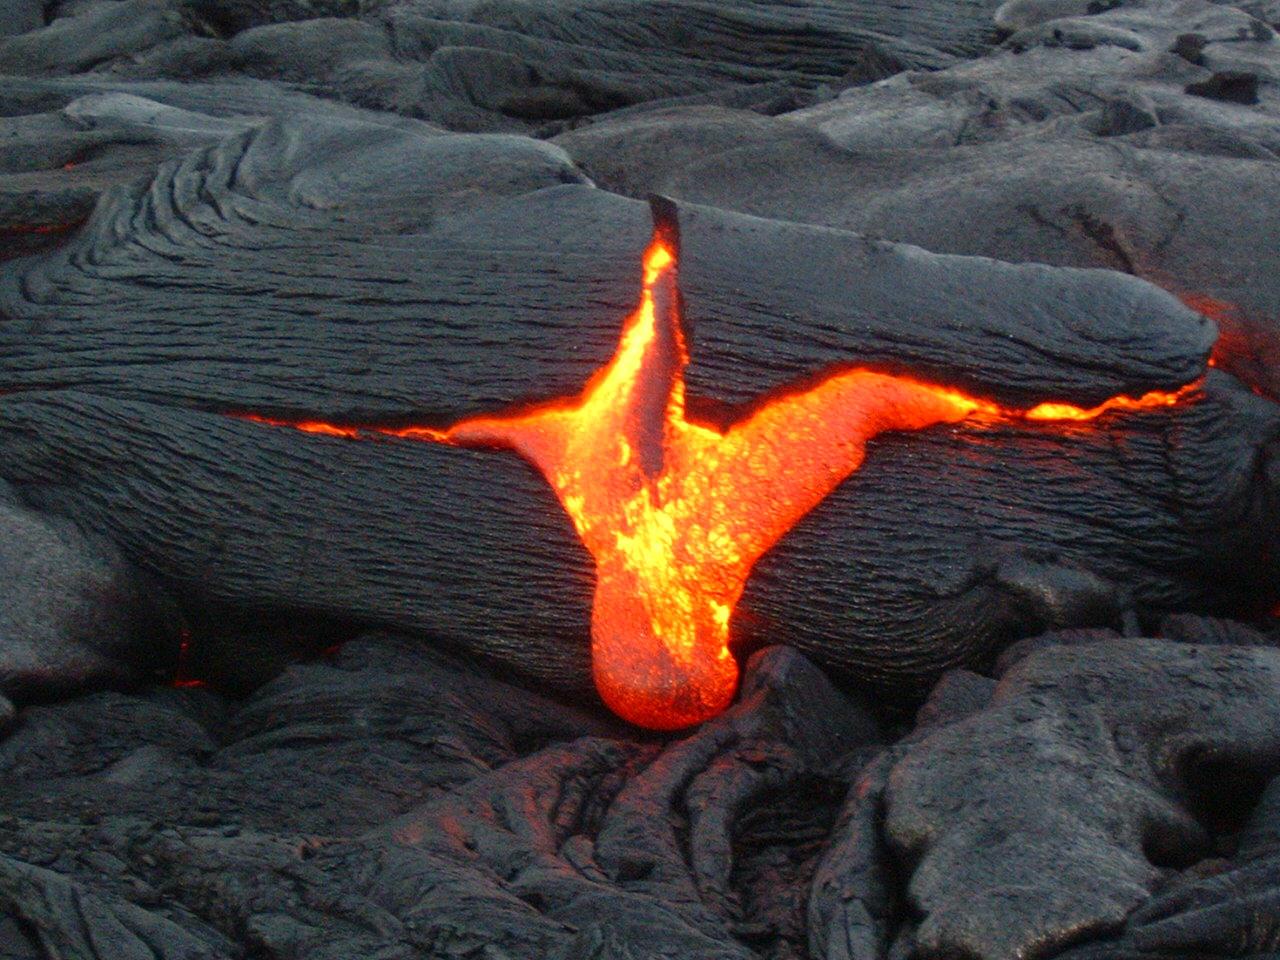 Oozing Lava by hitokirivader on DeviantArt